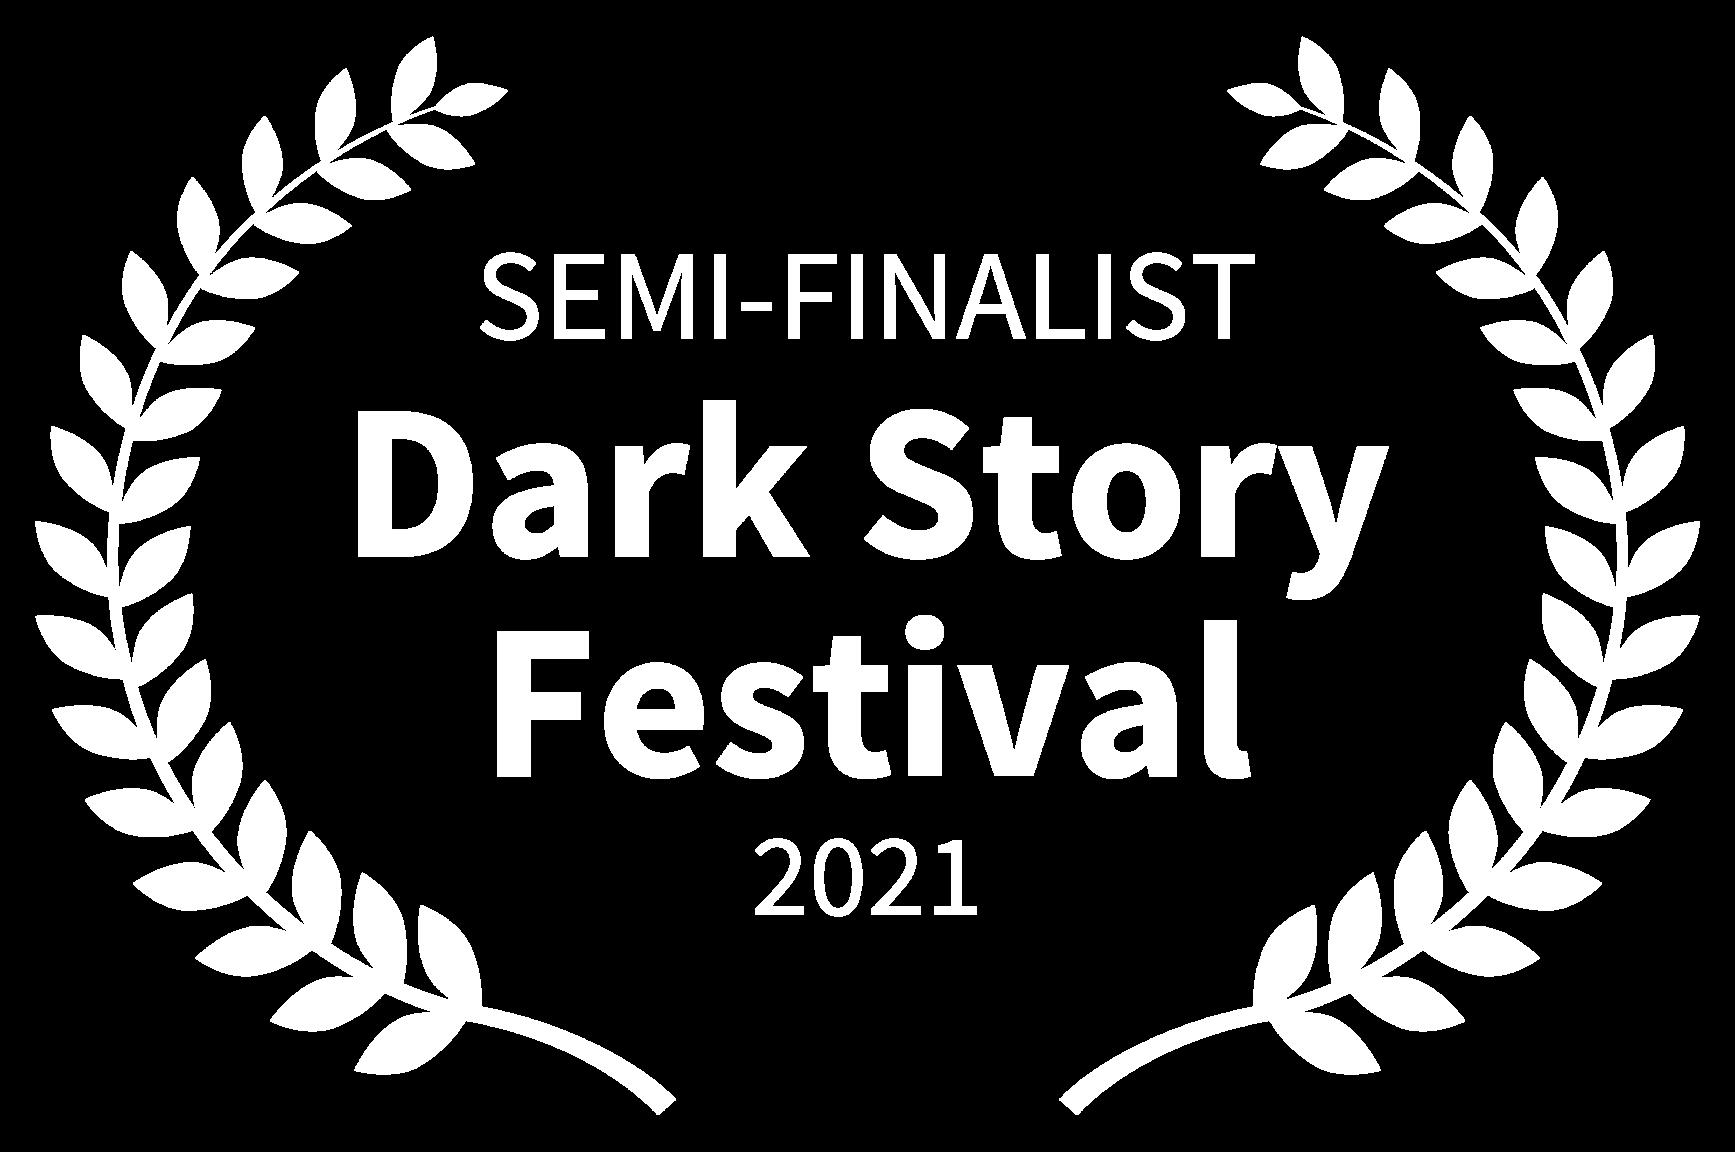 SEMI-FINALIST - Dark Story Festival - 2021